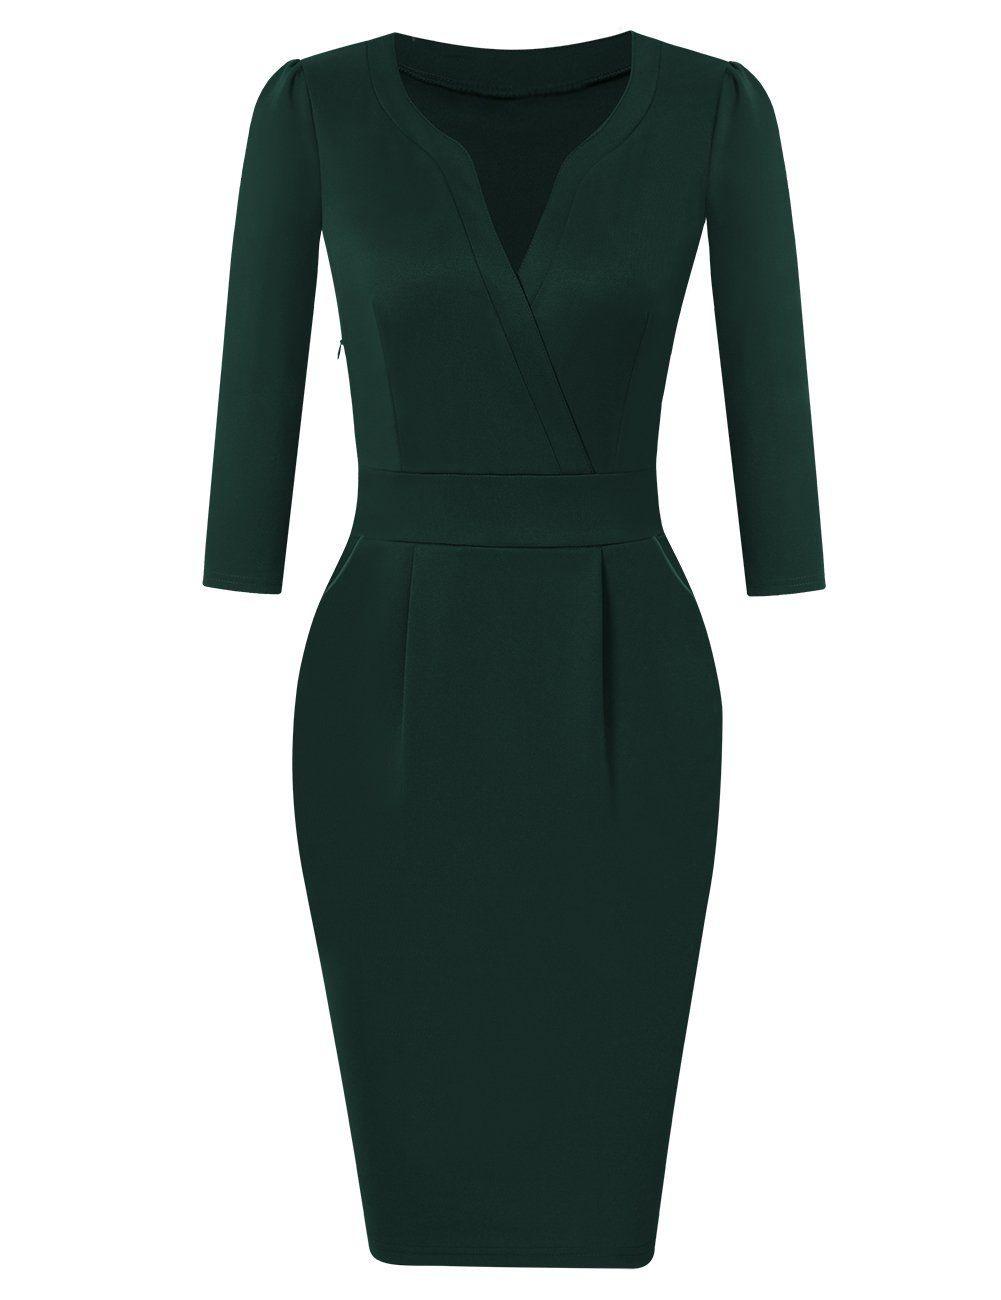 10 Perfekt Kleid Damen Elegant Bester Preis10 Genial Kleid Damen Elegant Design